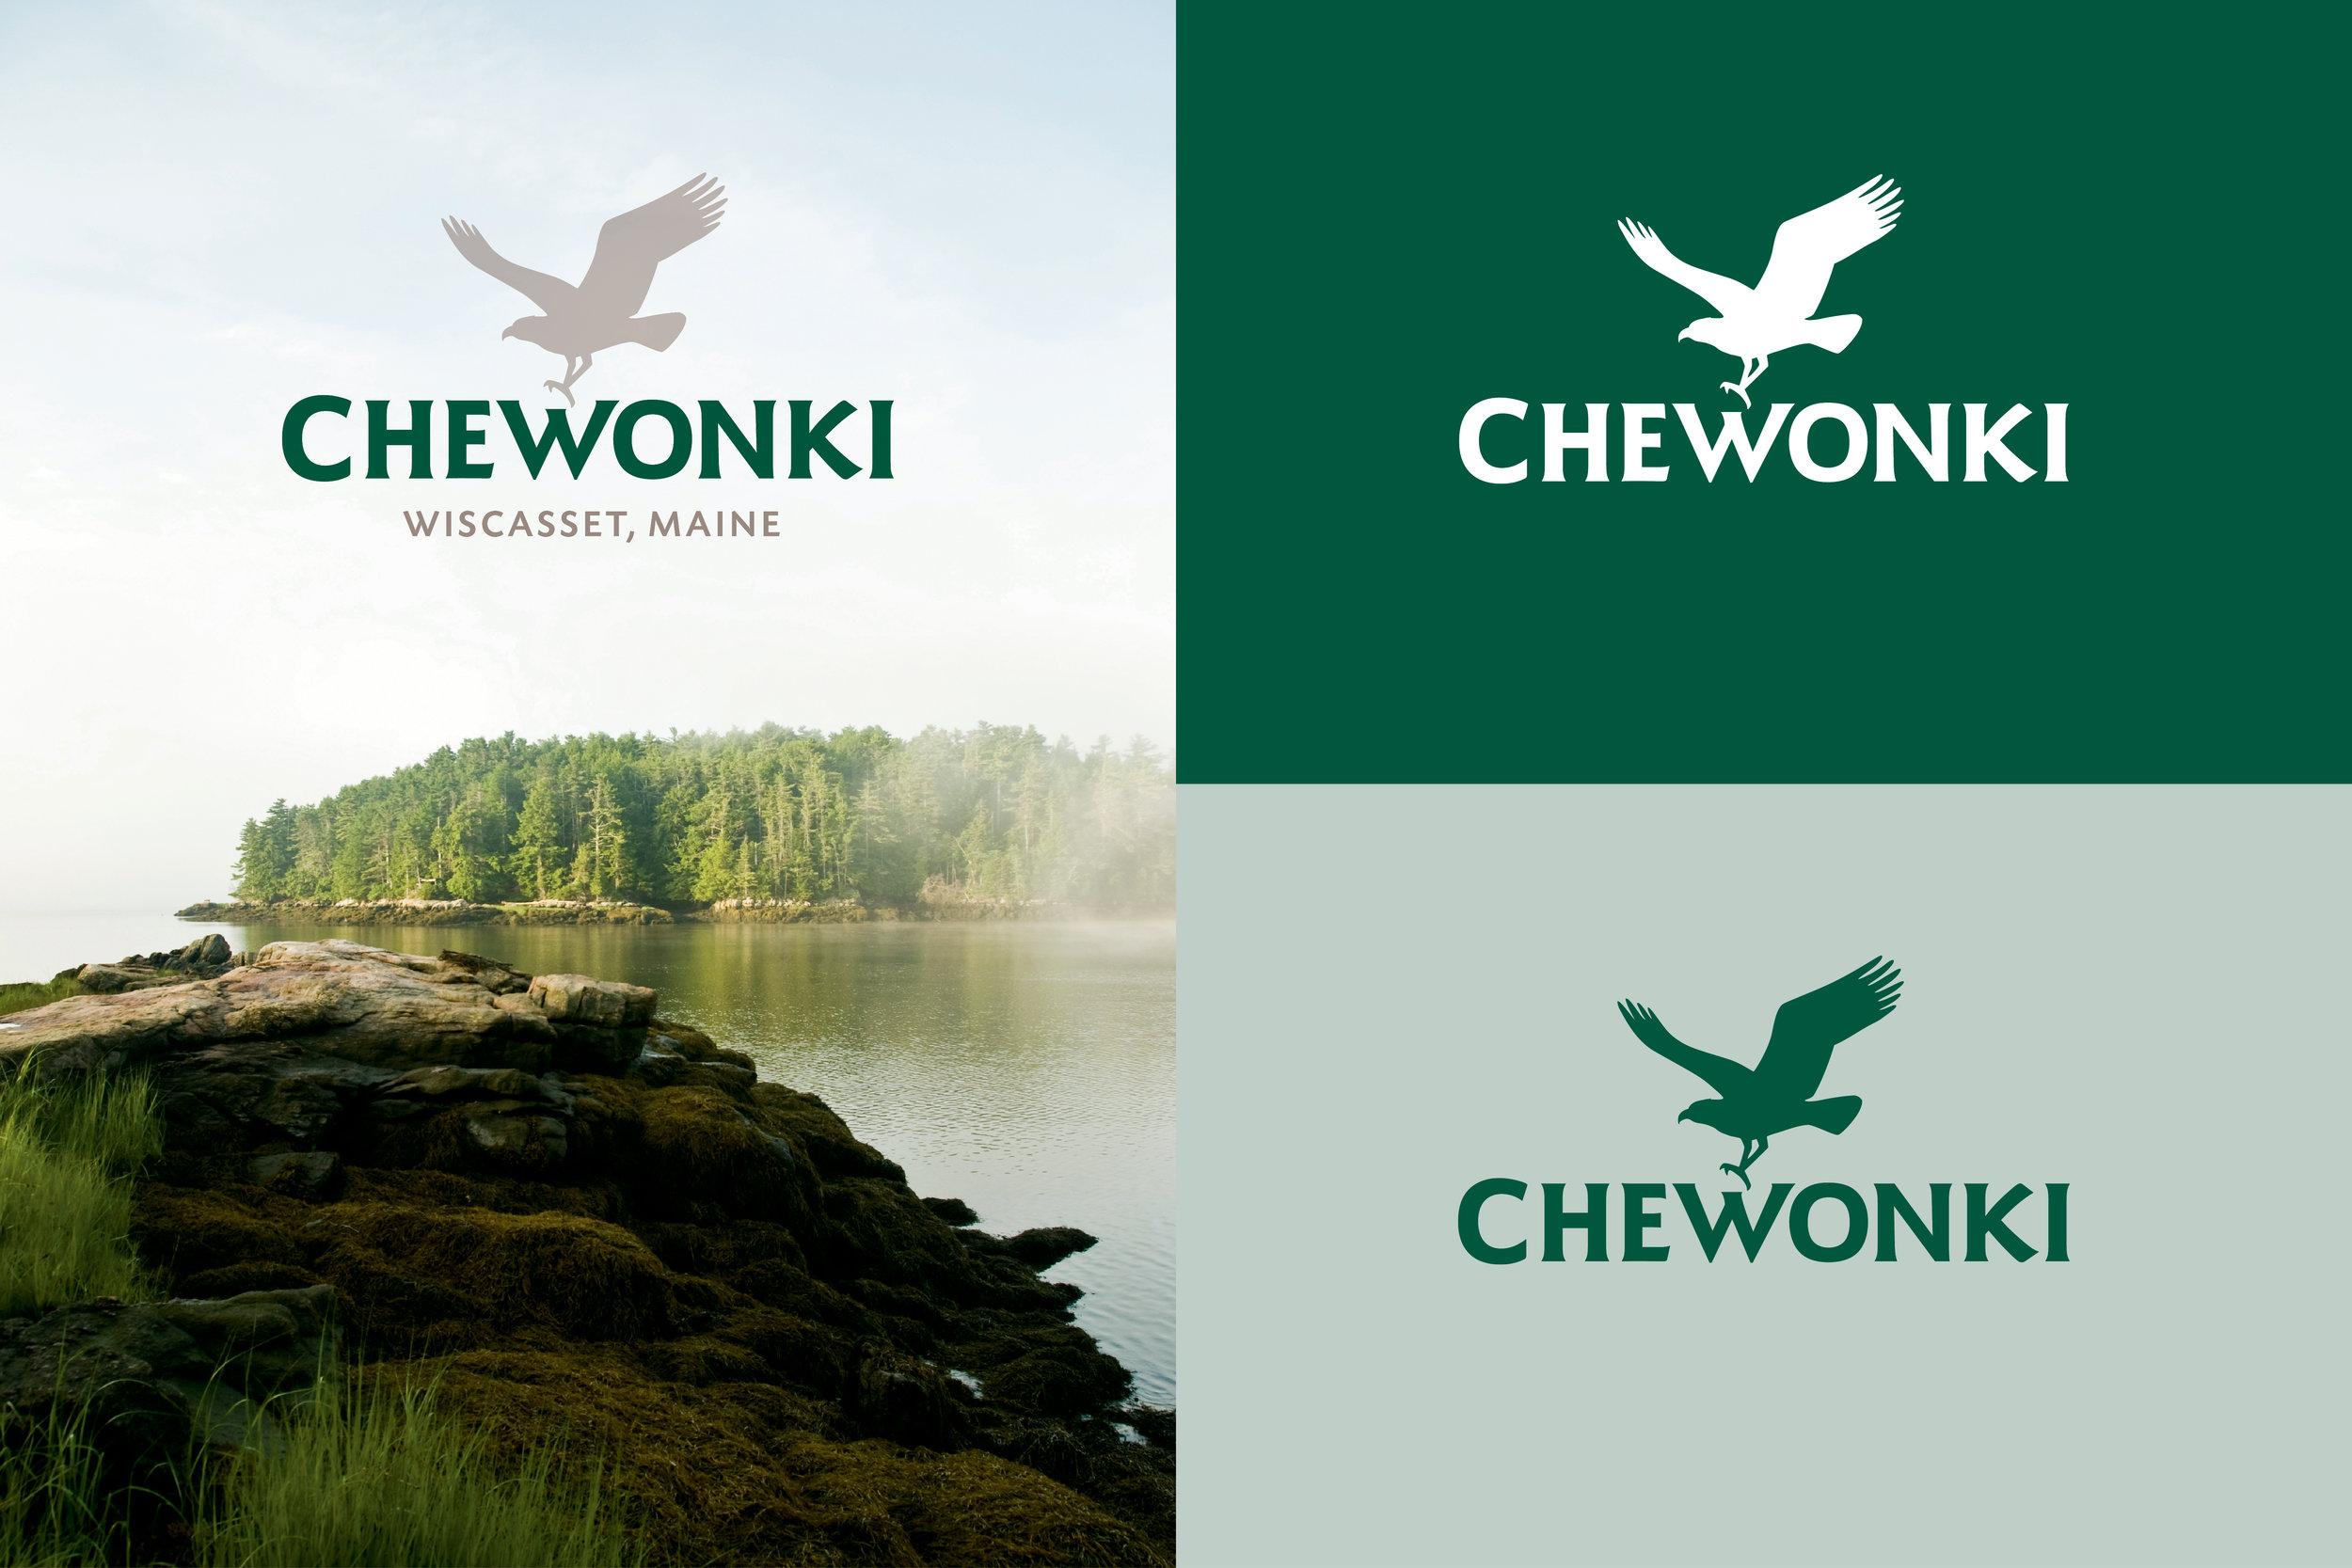 chewonki_branding-squarespace2.jpg